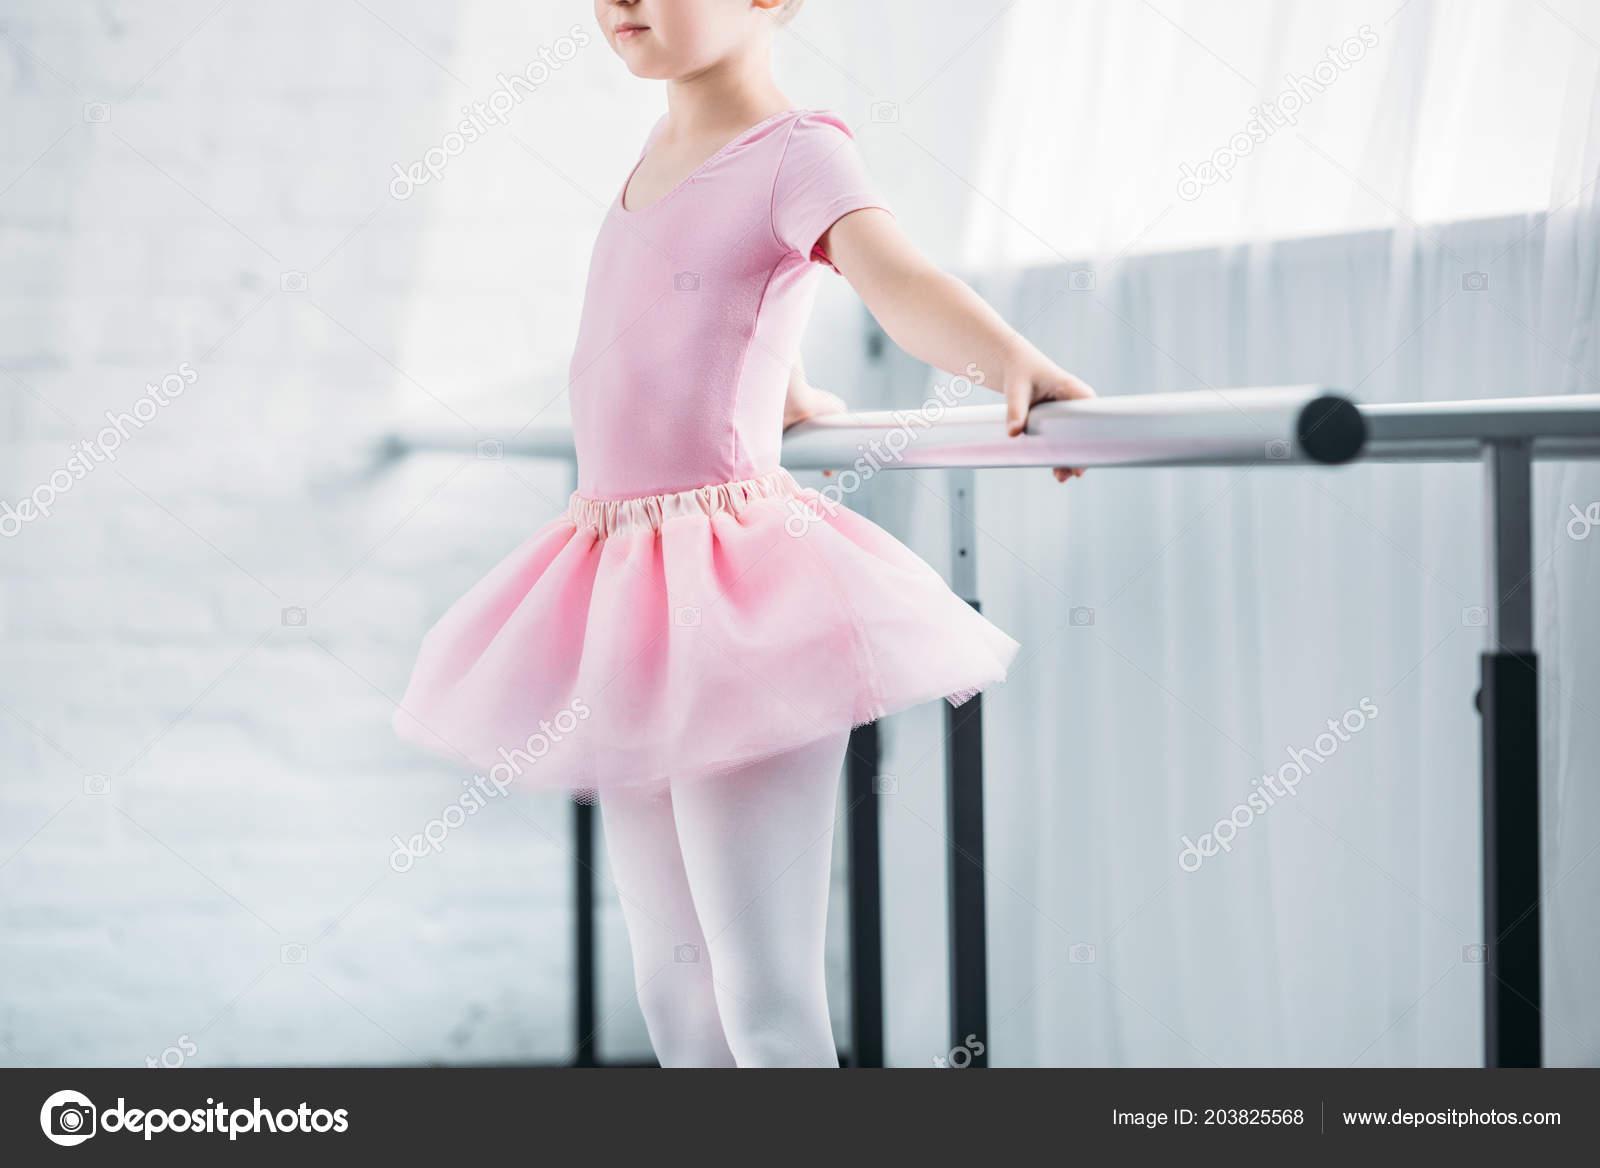 cf27c5a368a Περικοπεί Shot Παιδί Ροζ Τουτού Εξάσκηση Μπαλέτου Στο Studio — Φωτογραφία  Αρχείου